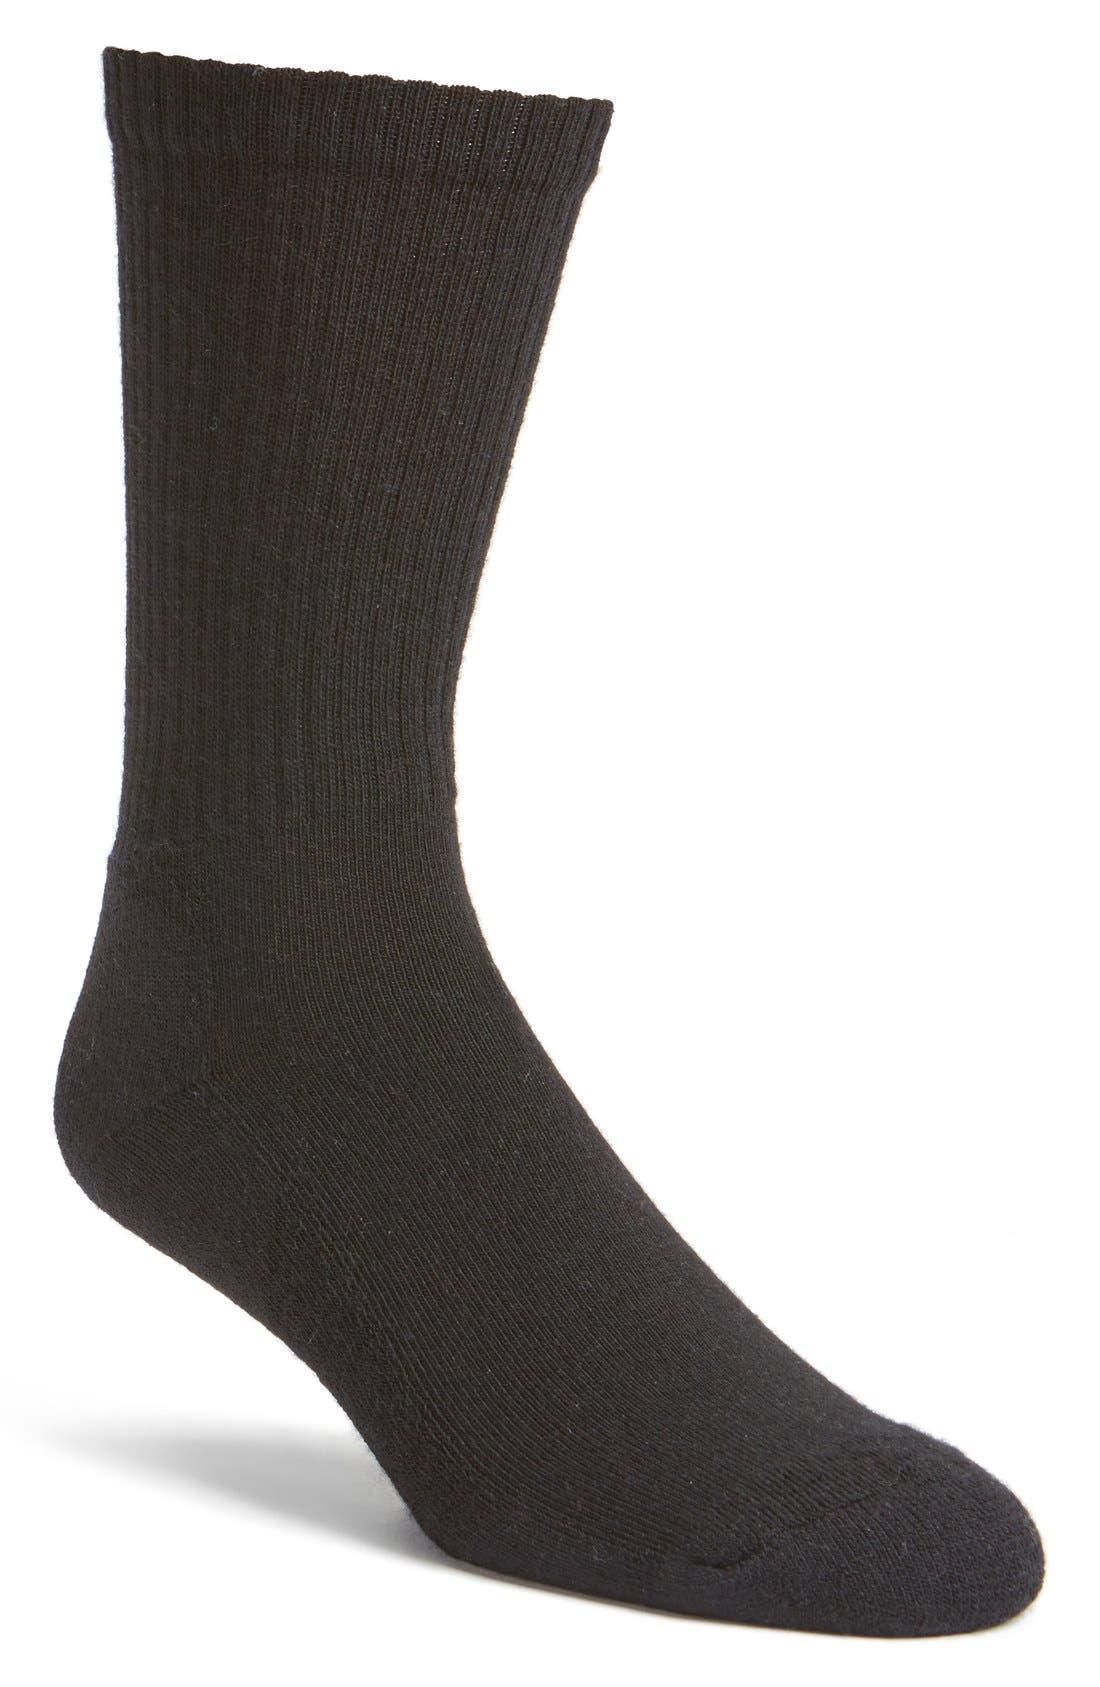 Alternate Image 1 Selected - Smartwool Heathered Crew Socks (Men)